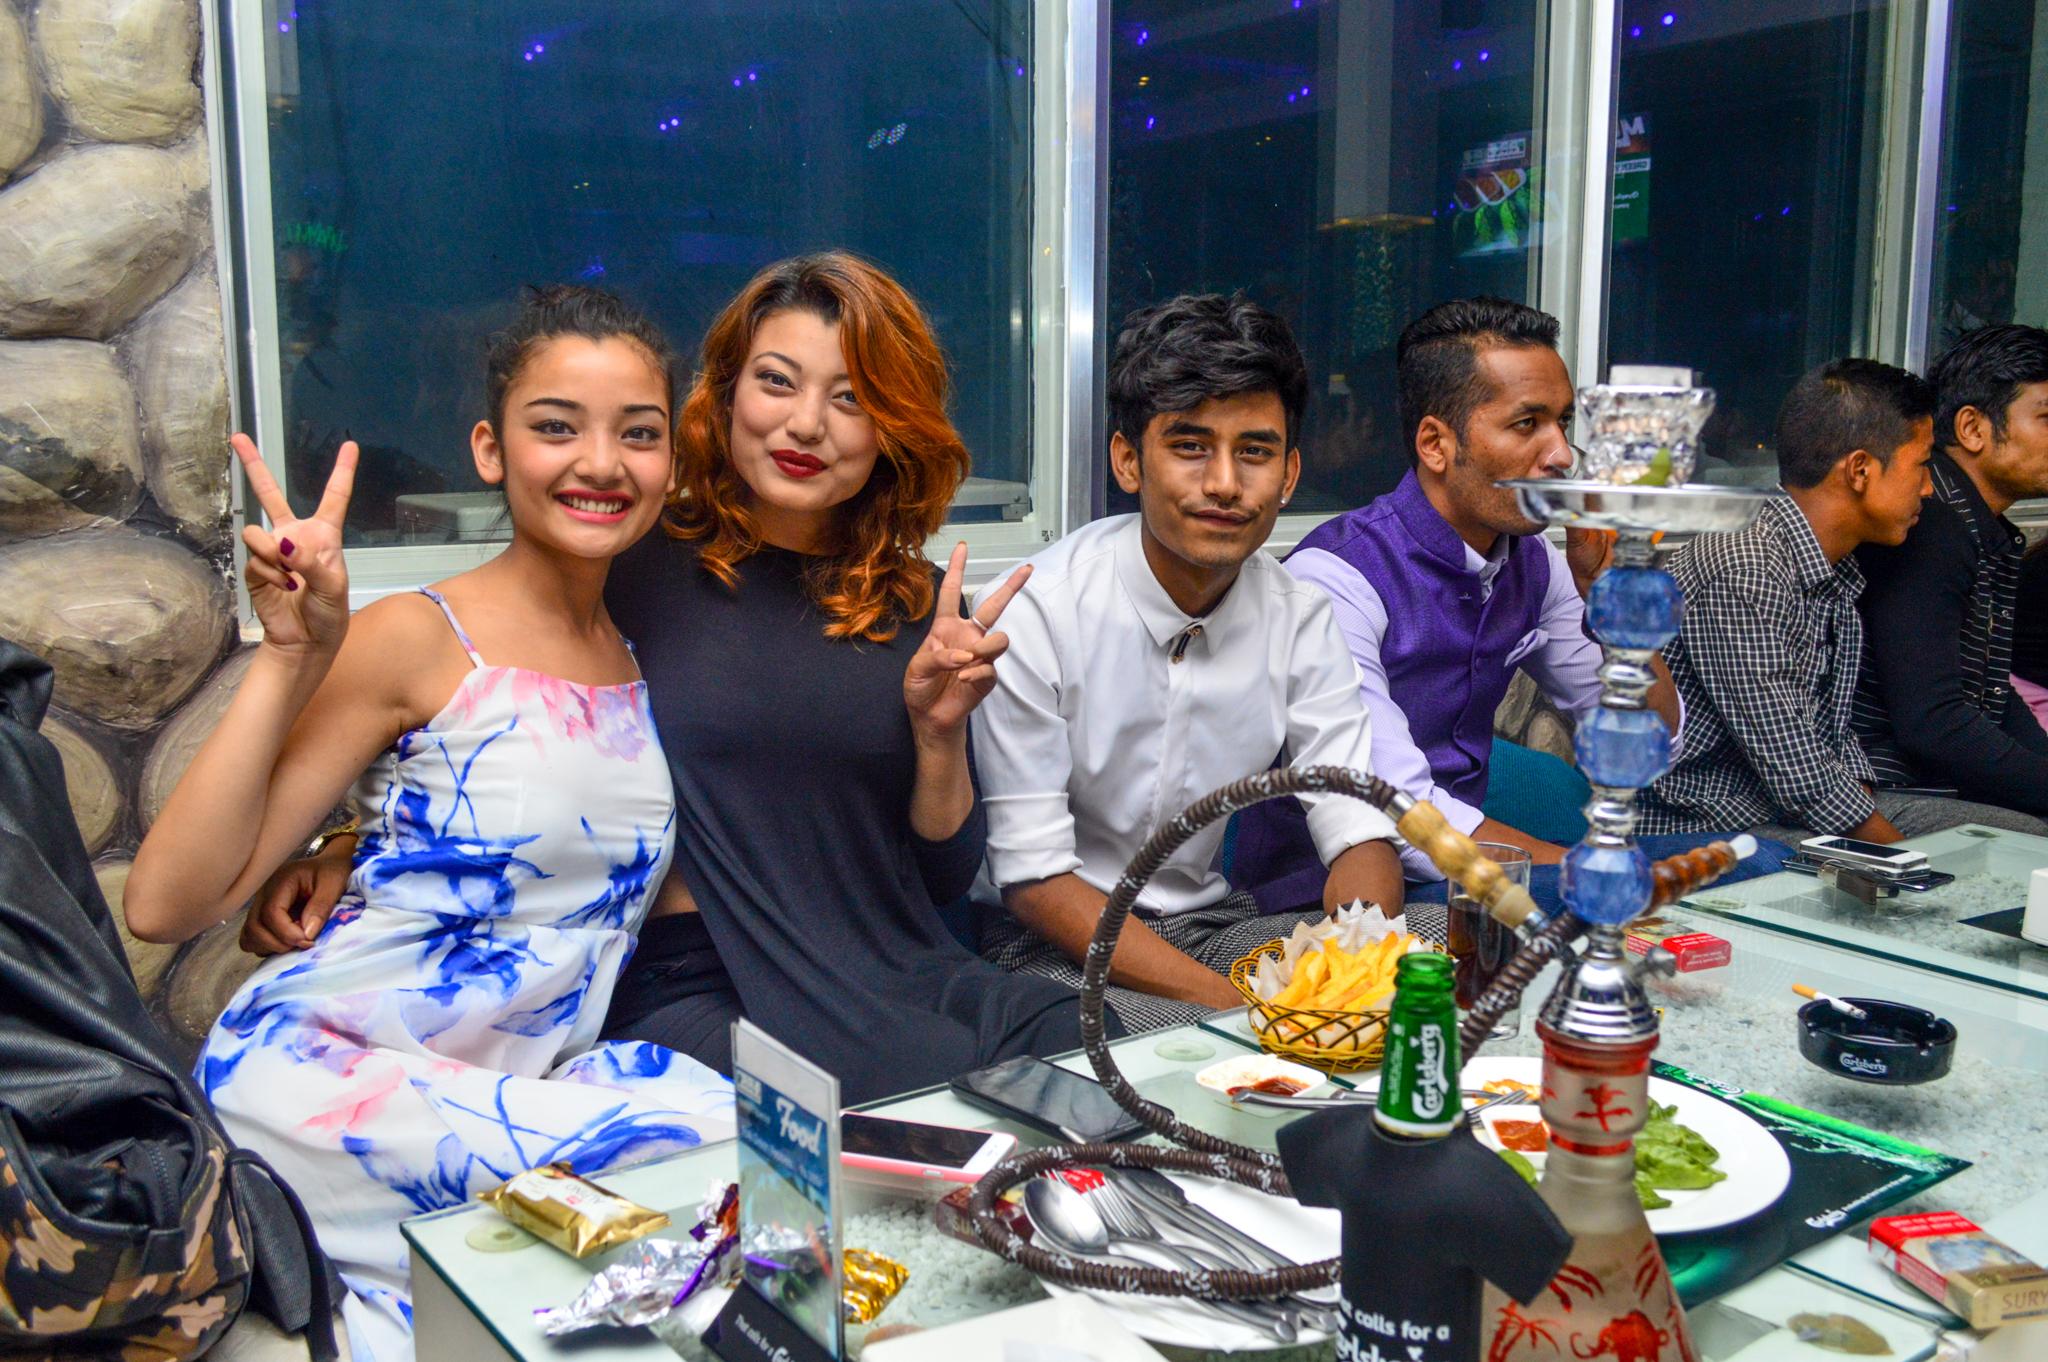 Sharon Shrestha with friends